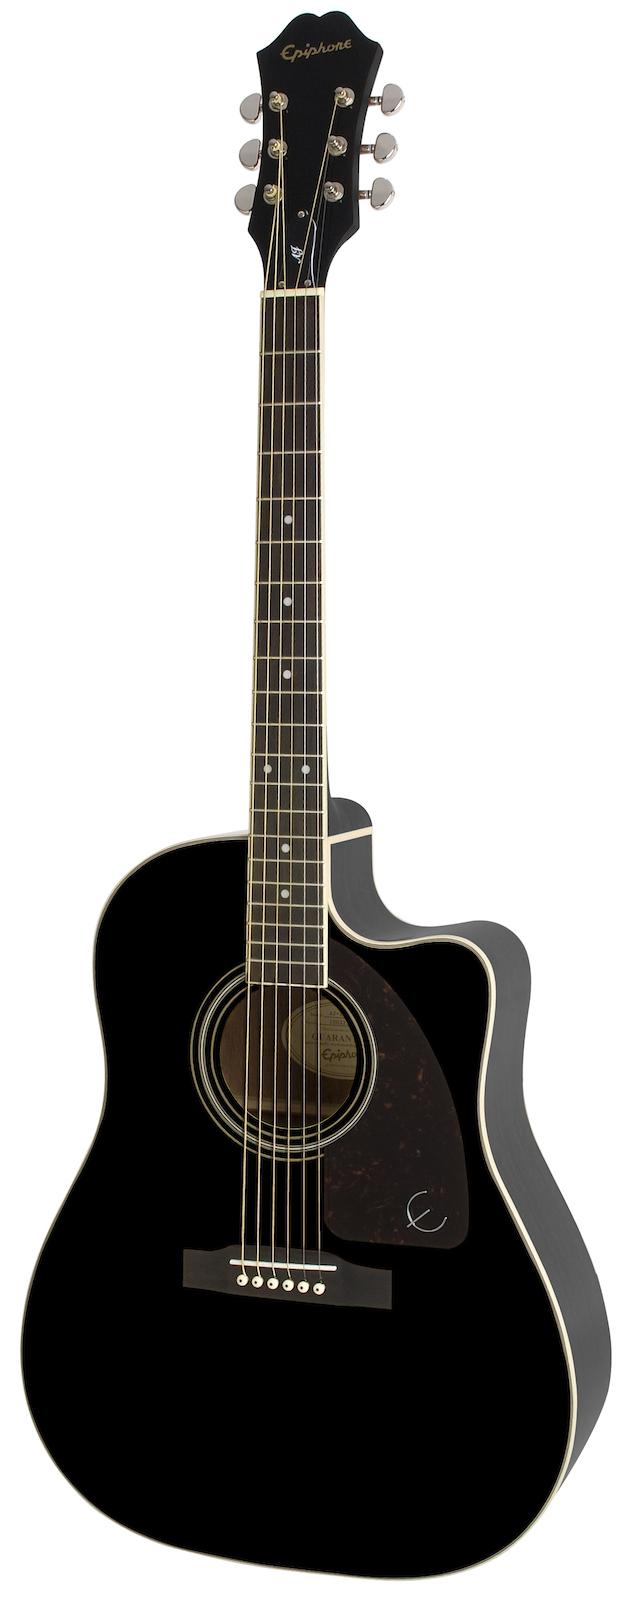 Epiphone Aj-220sce Ebony Black